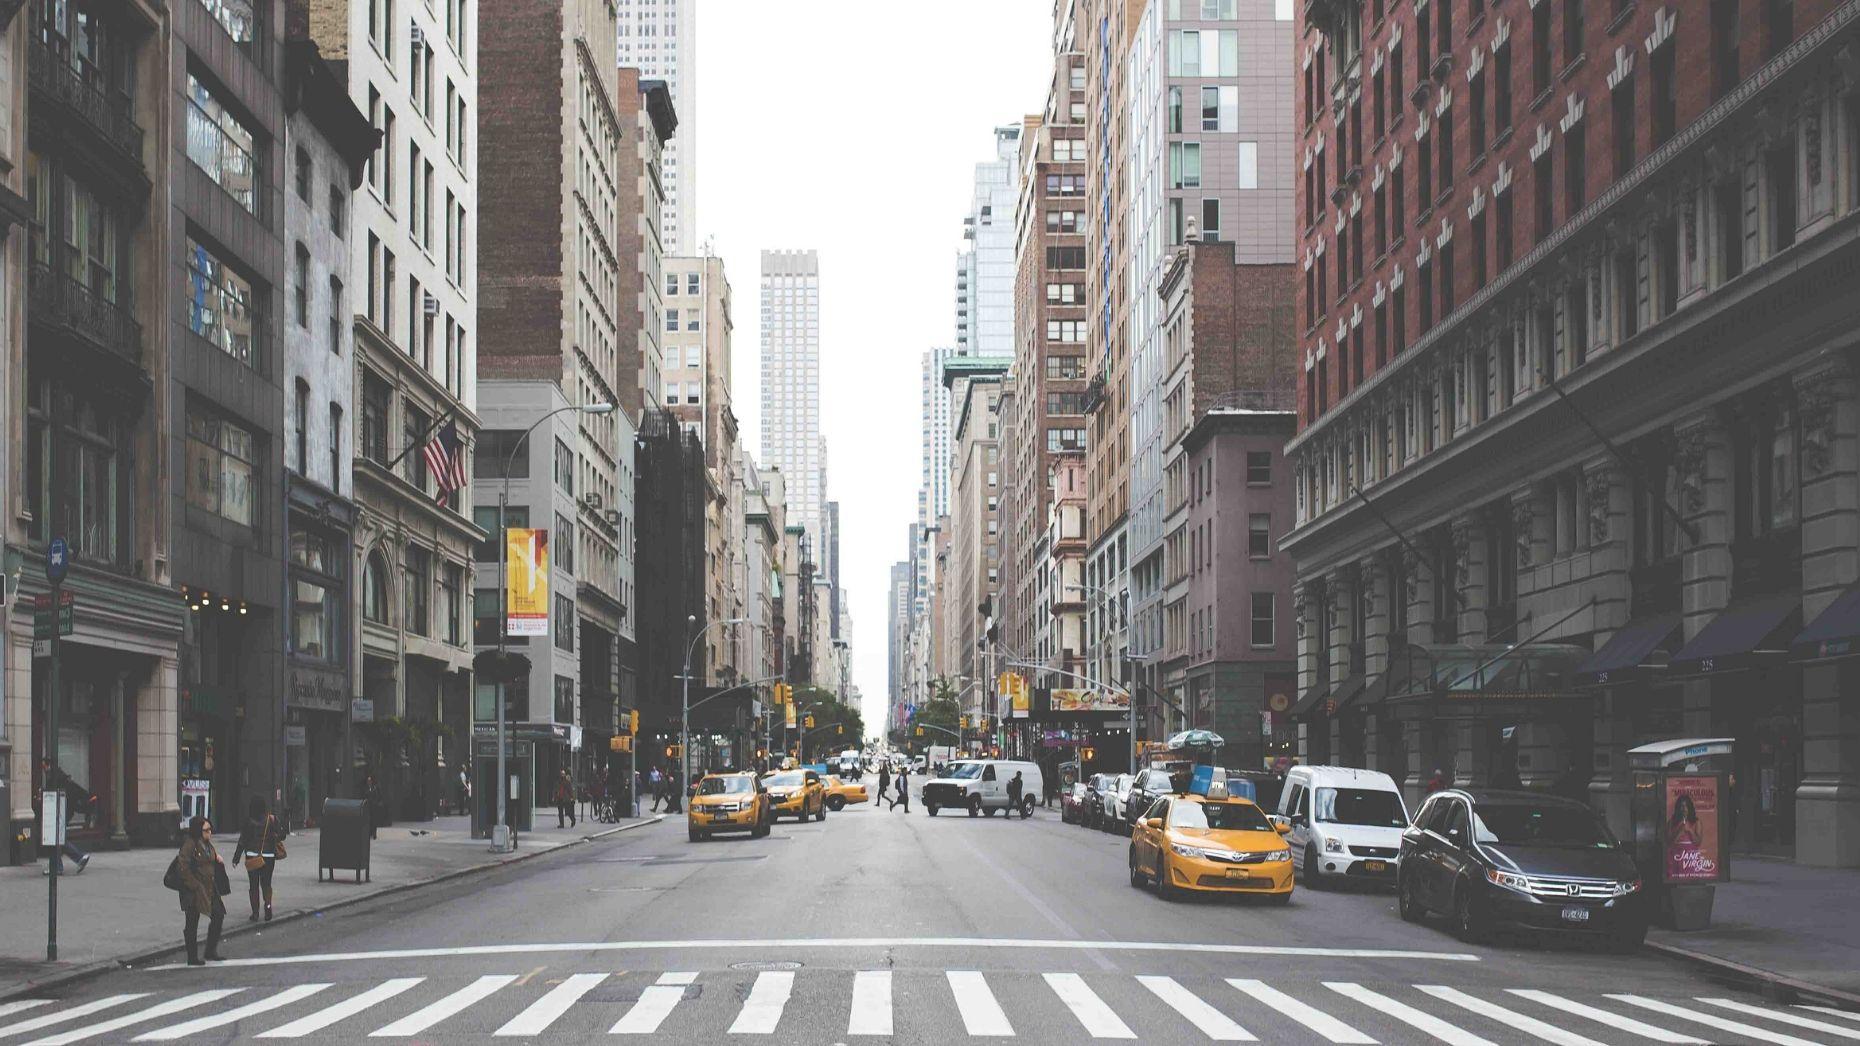 StreetEasy may cut off Douglas Elliman's access to rental listing platform